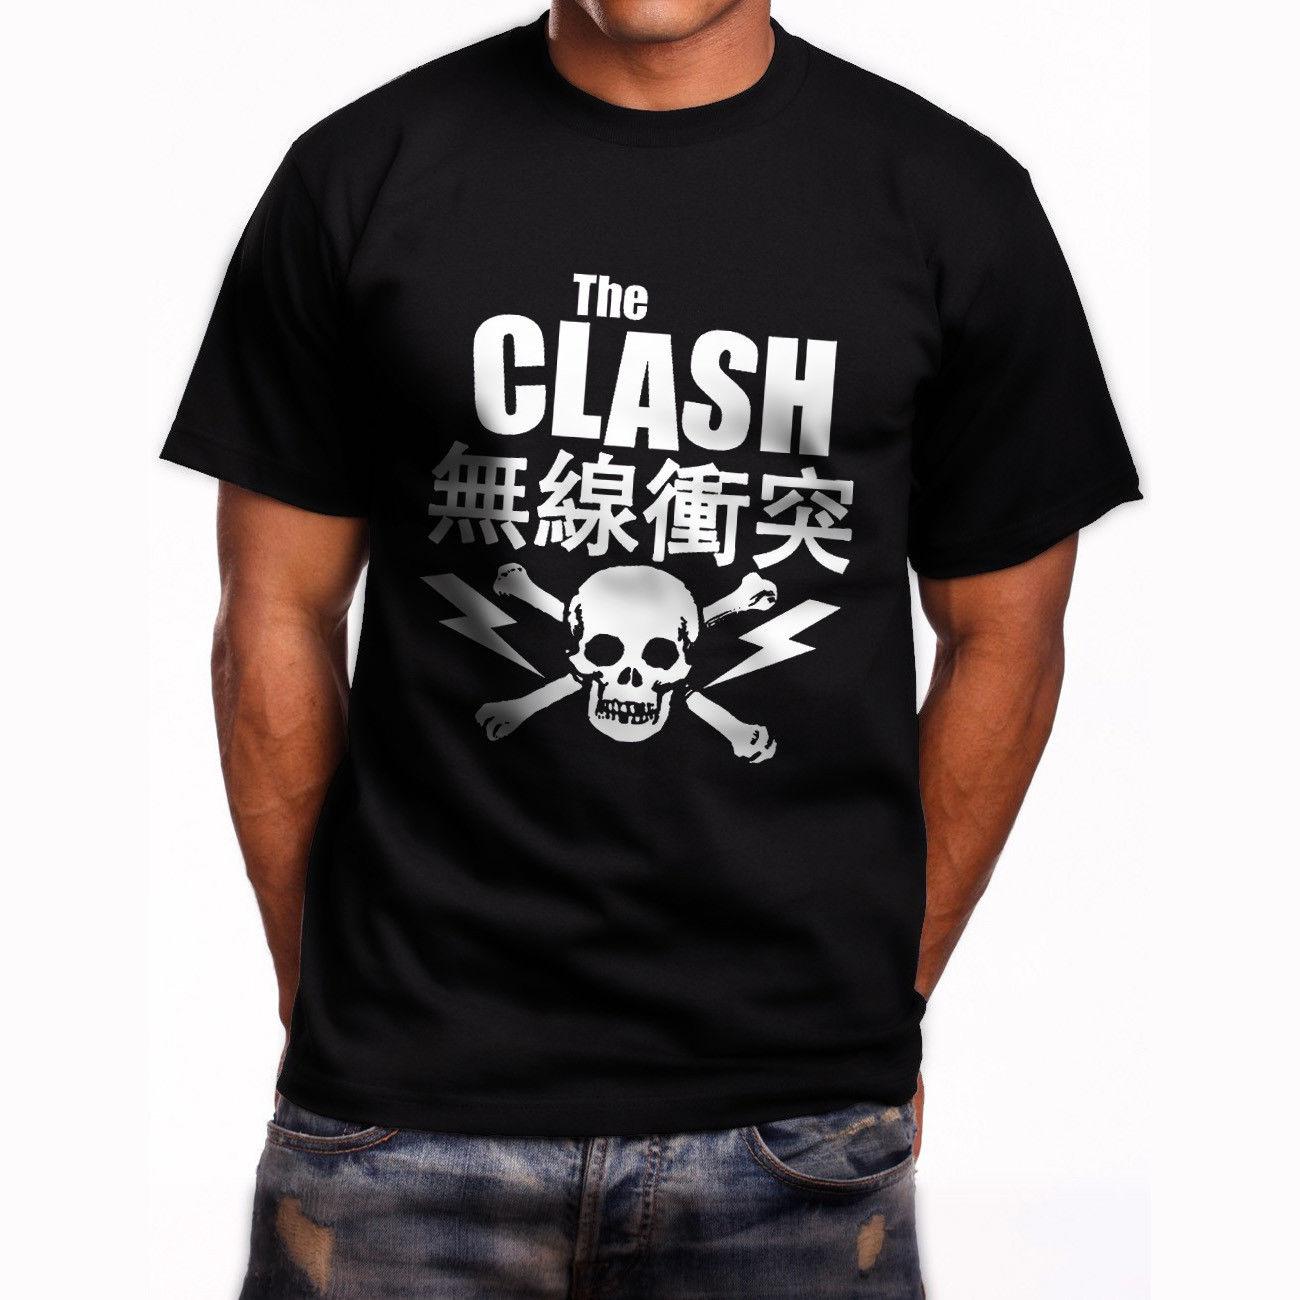 THE CLASH JAPANESE TOUR <font><b>SKULL</b></font> TEXT Mens Black <font><b>T-Shirt</b></font> Size S-3XL ROCK//PUNK/<font><b>ICON</b></font> Summer Short Sleeves Cotton Fashion t Shirt